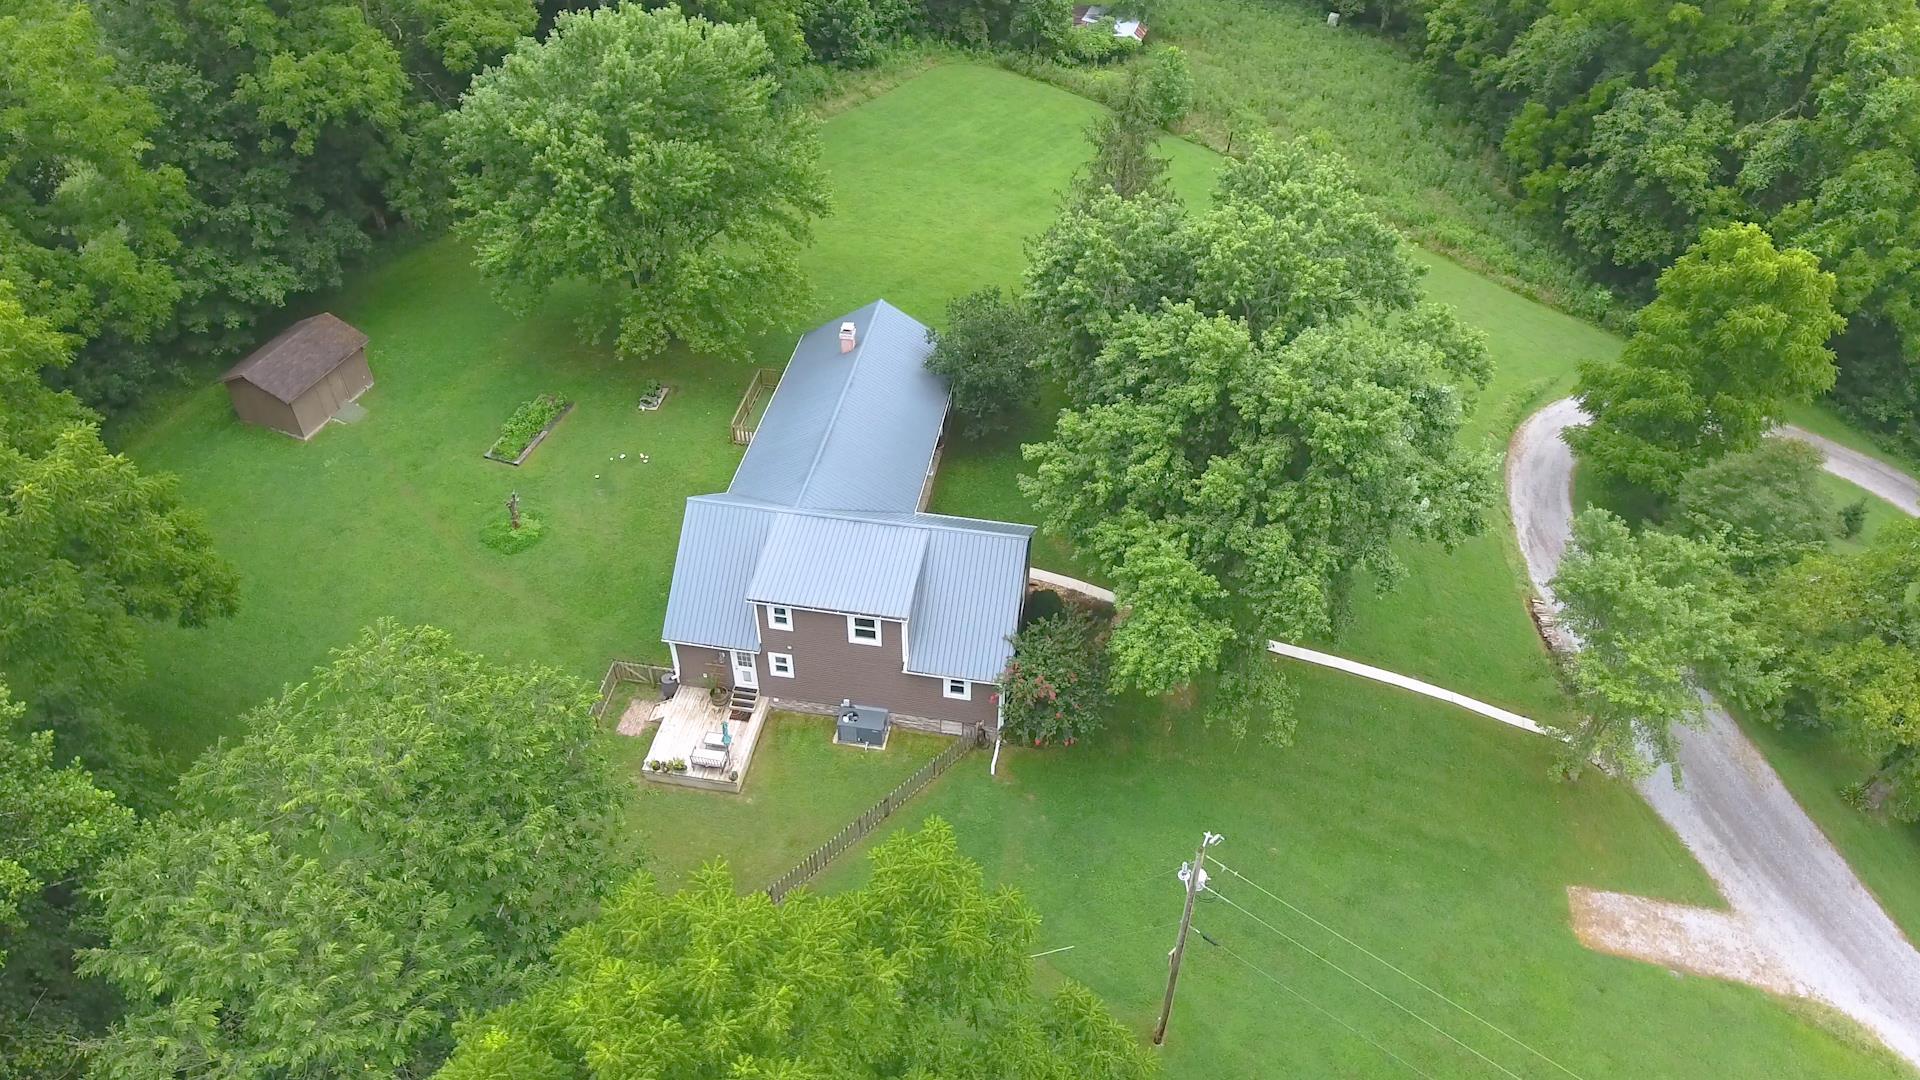 191 Bobby Davenport Ln, Woodbury, TN 37190 - Woodbury, TN real estate listing